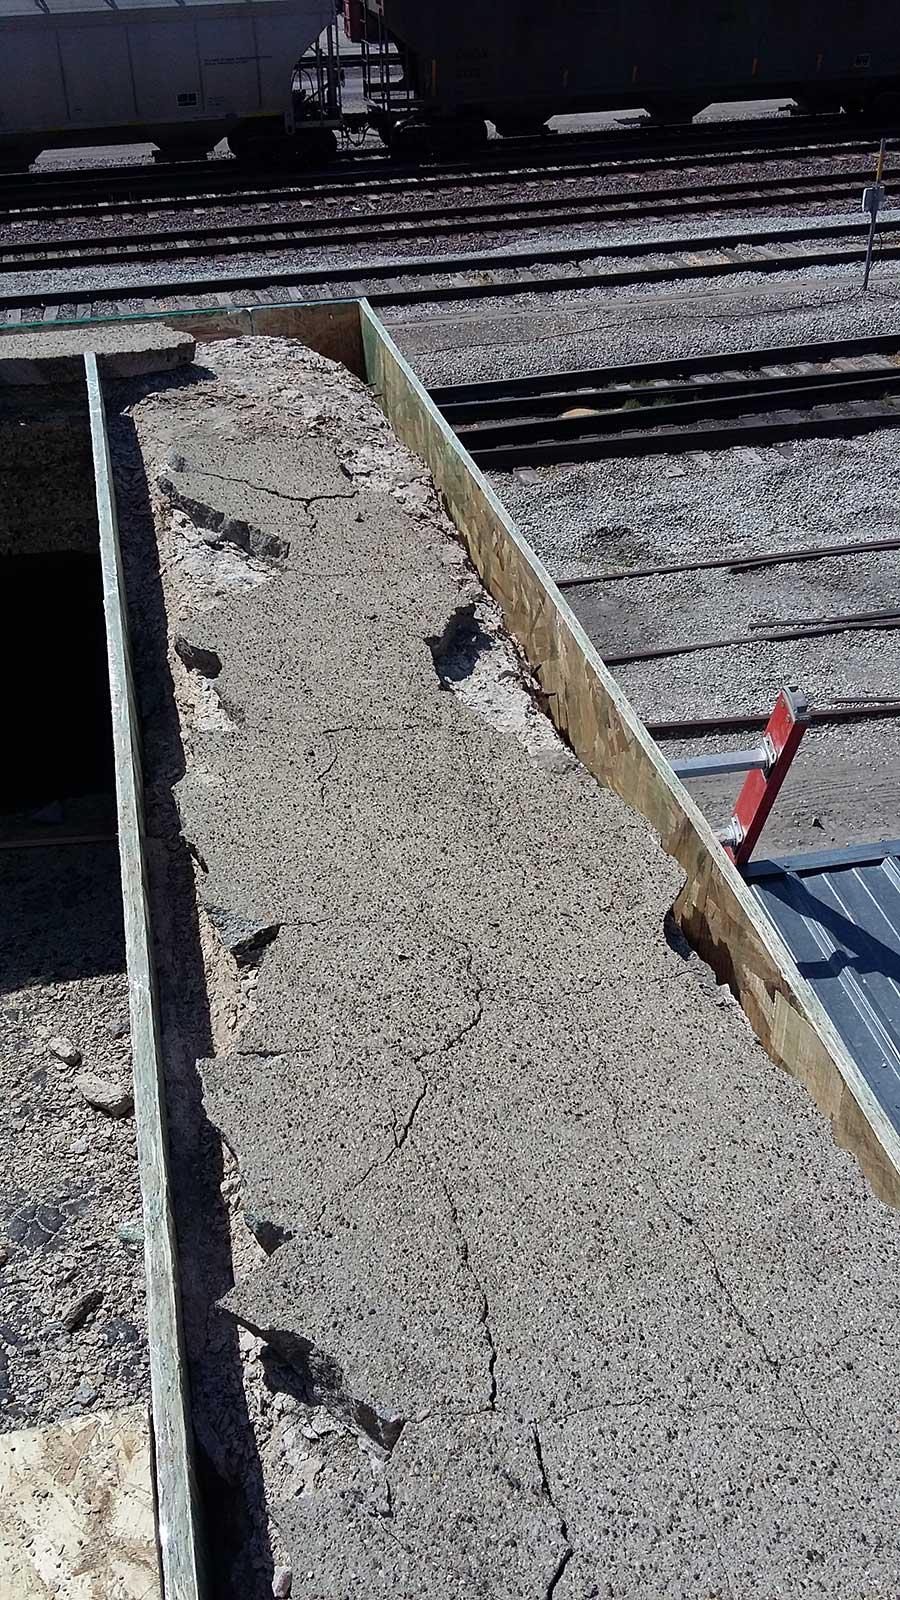 Failed coating and environmental damage to ridge cap